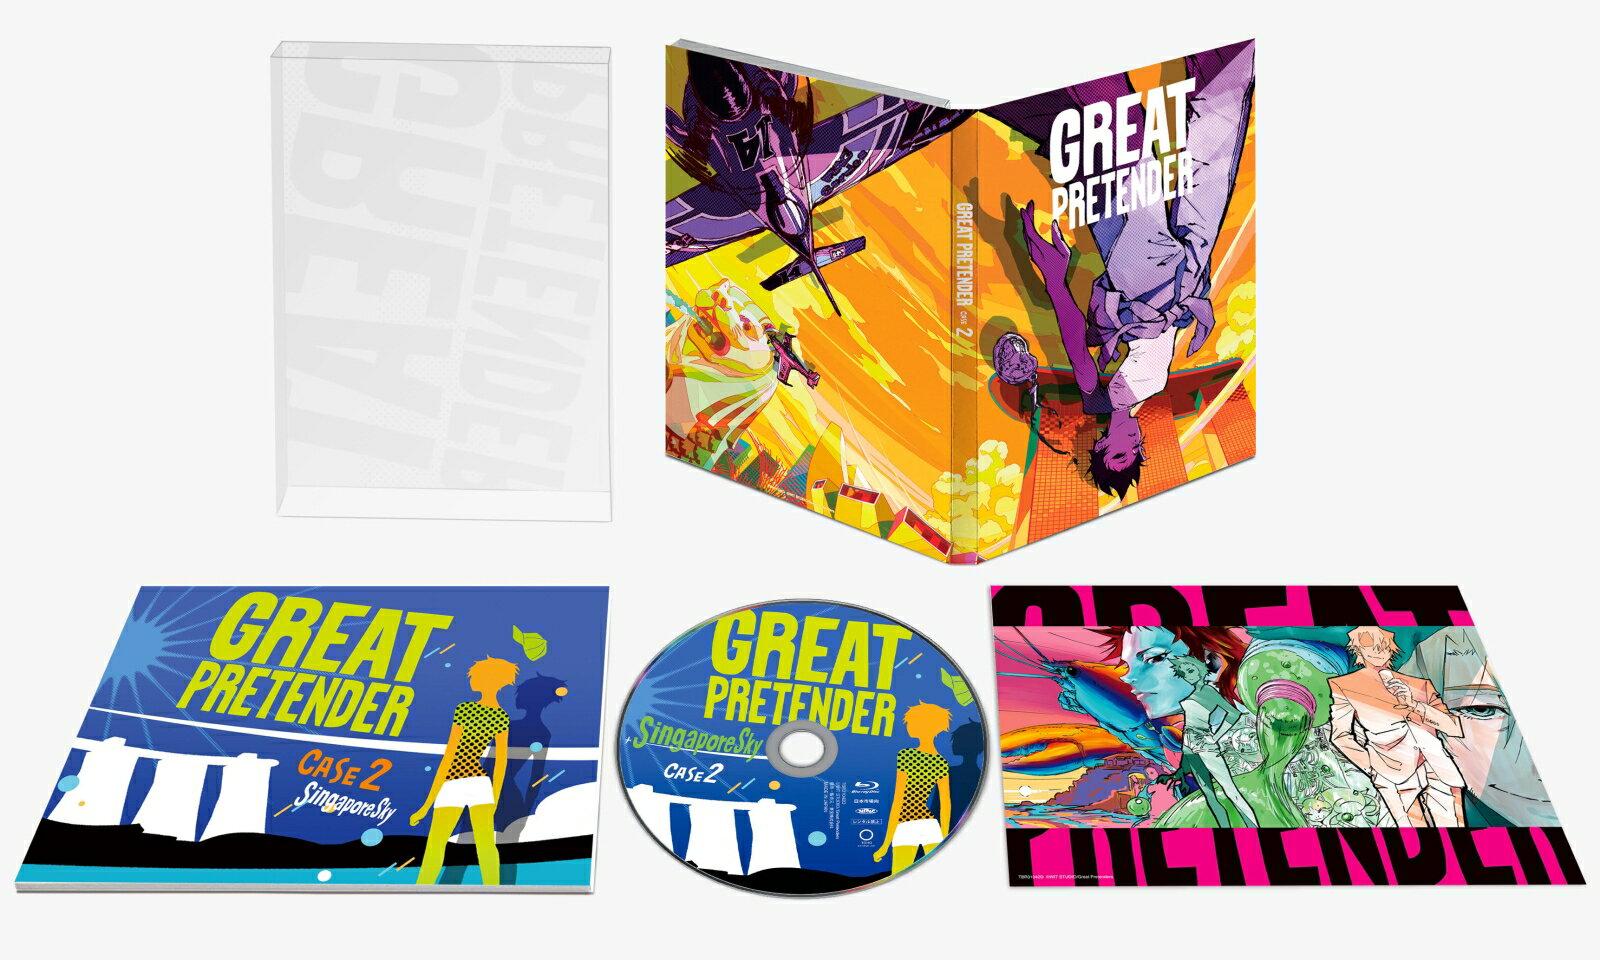 「GREAT PRETENDER」CASE 2 シンガポール・スカイ【Blu-ray】 [ 小林千晃 ]画像